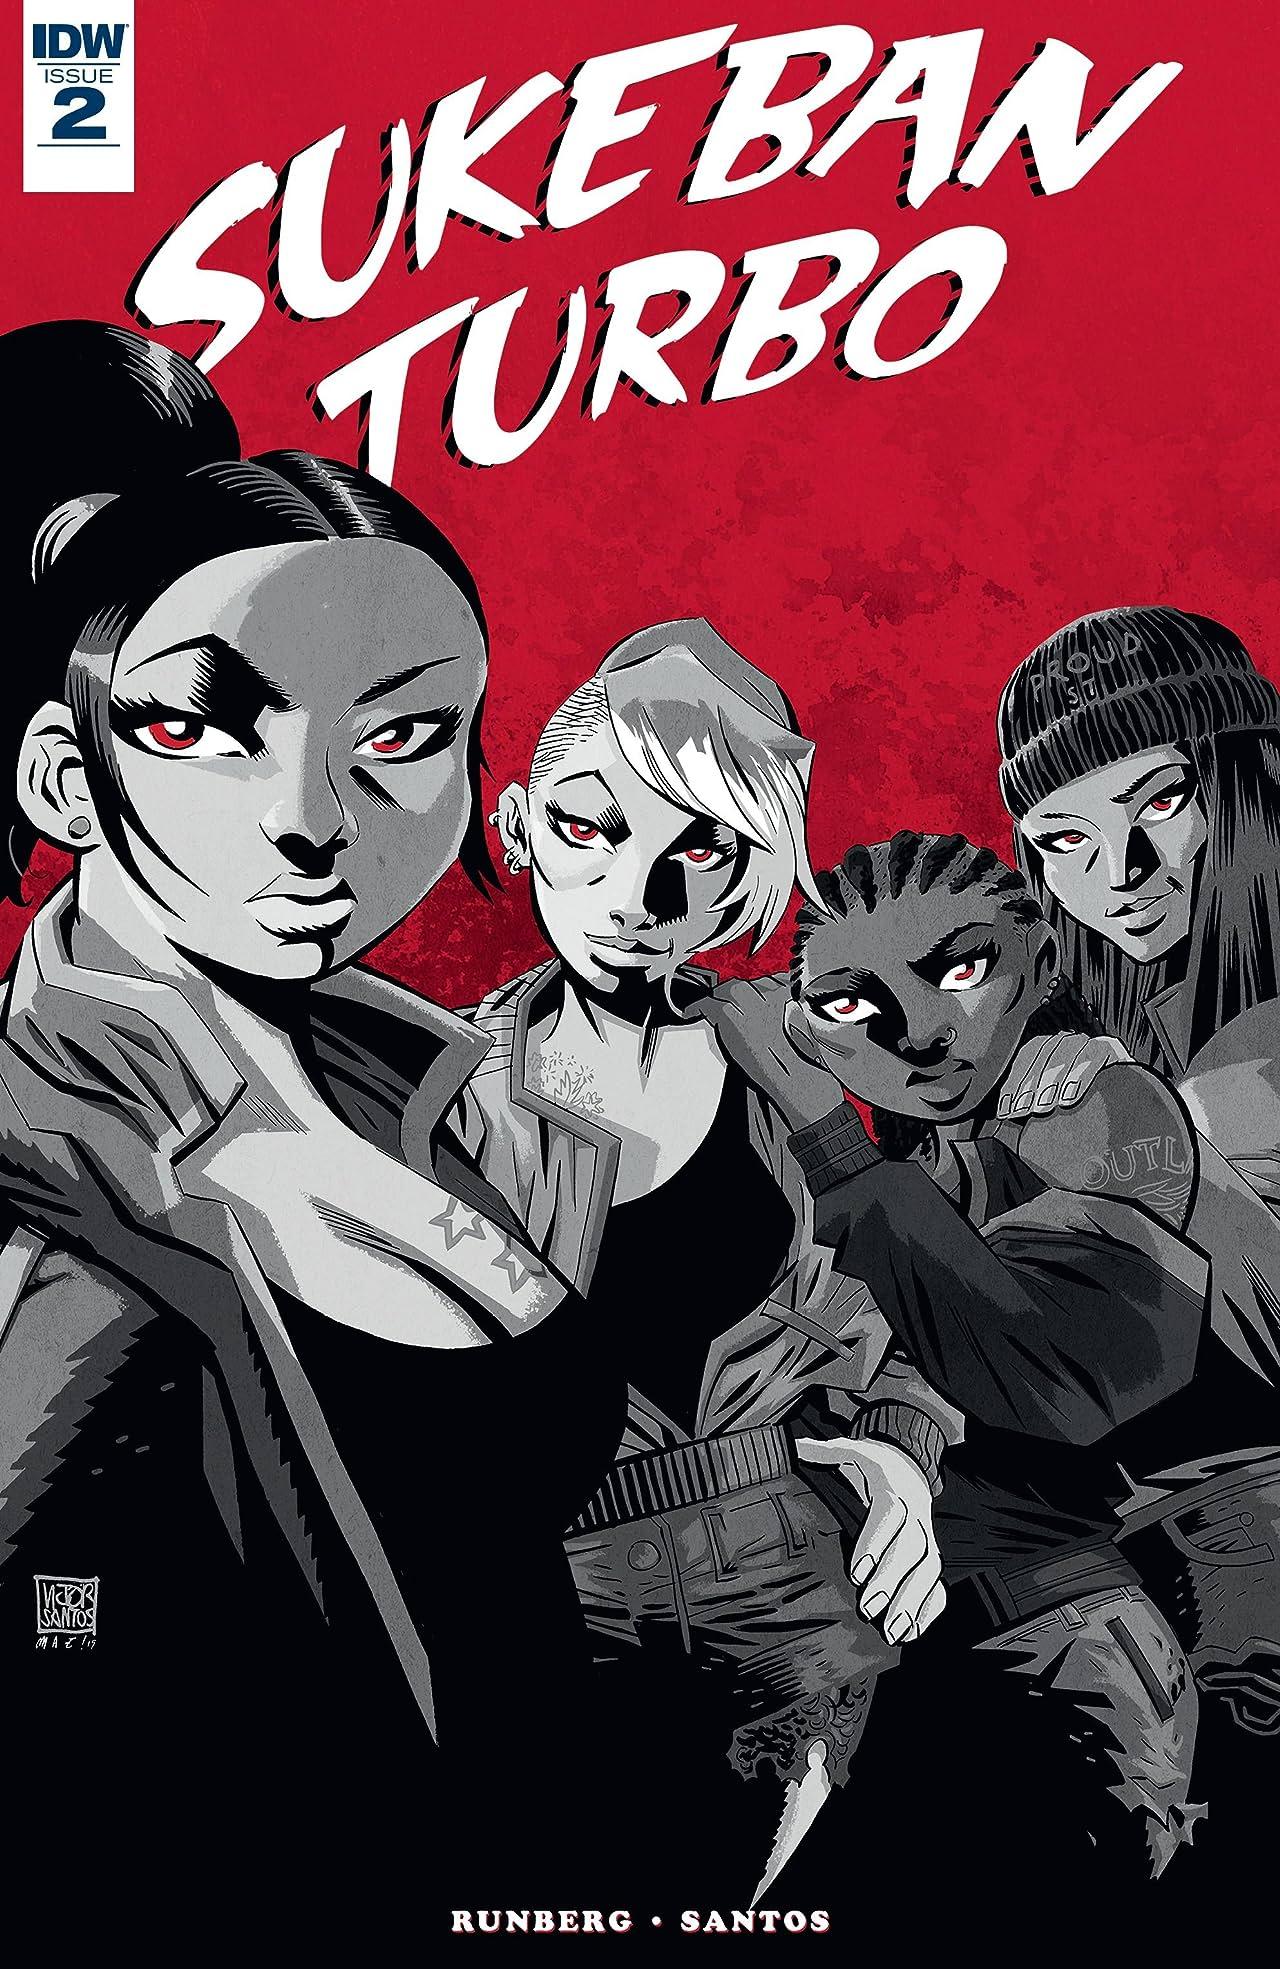 Sukeban Turbo #2